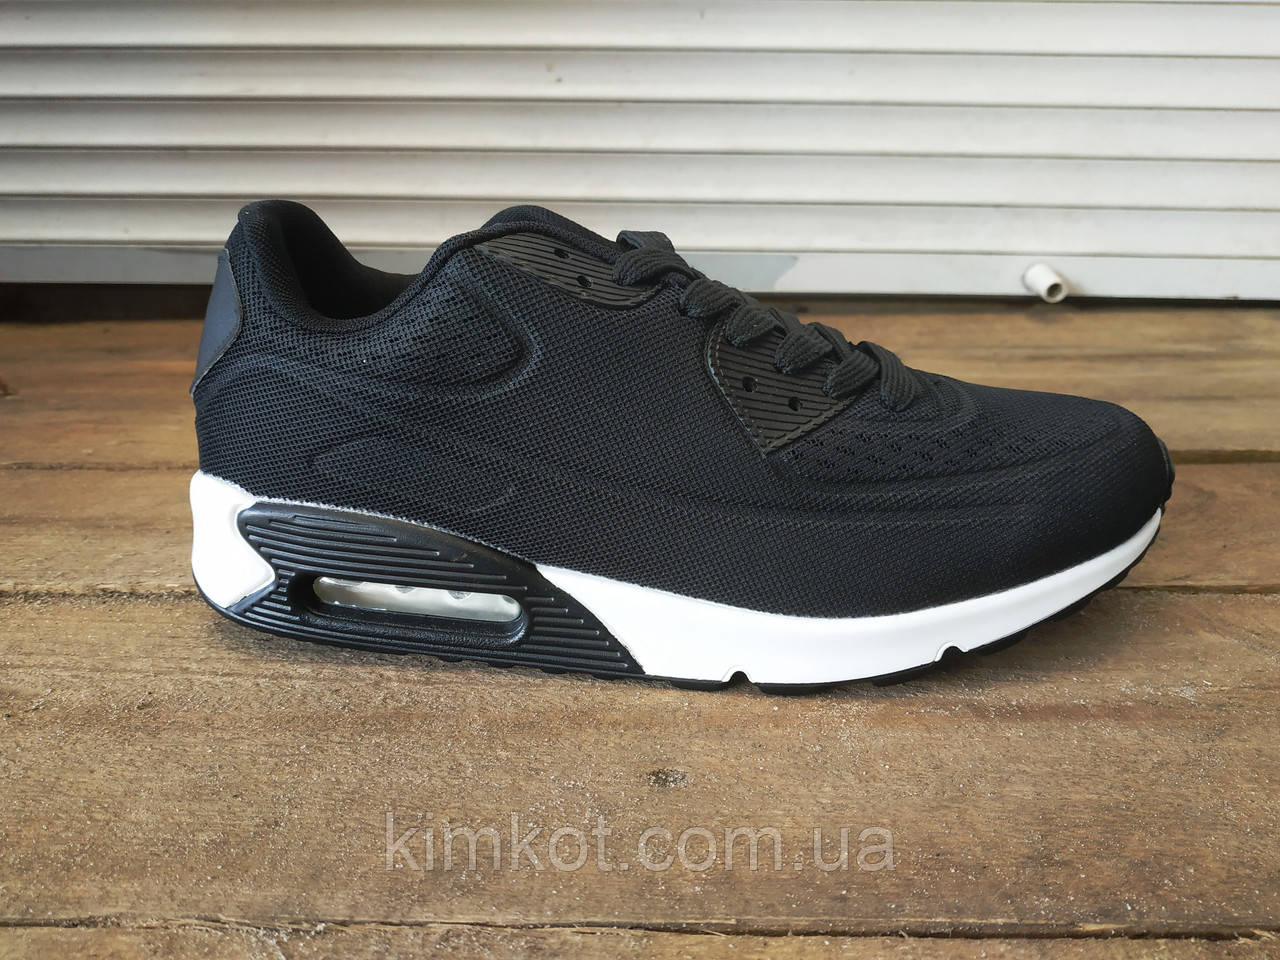 36314c76 Кроссовки мужские Nike Air Max 90 реплика 40 -45 р-р, цена 750 грн ...